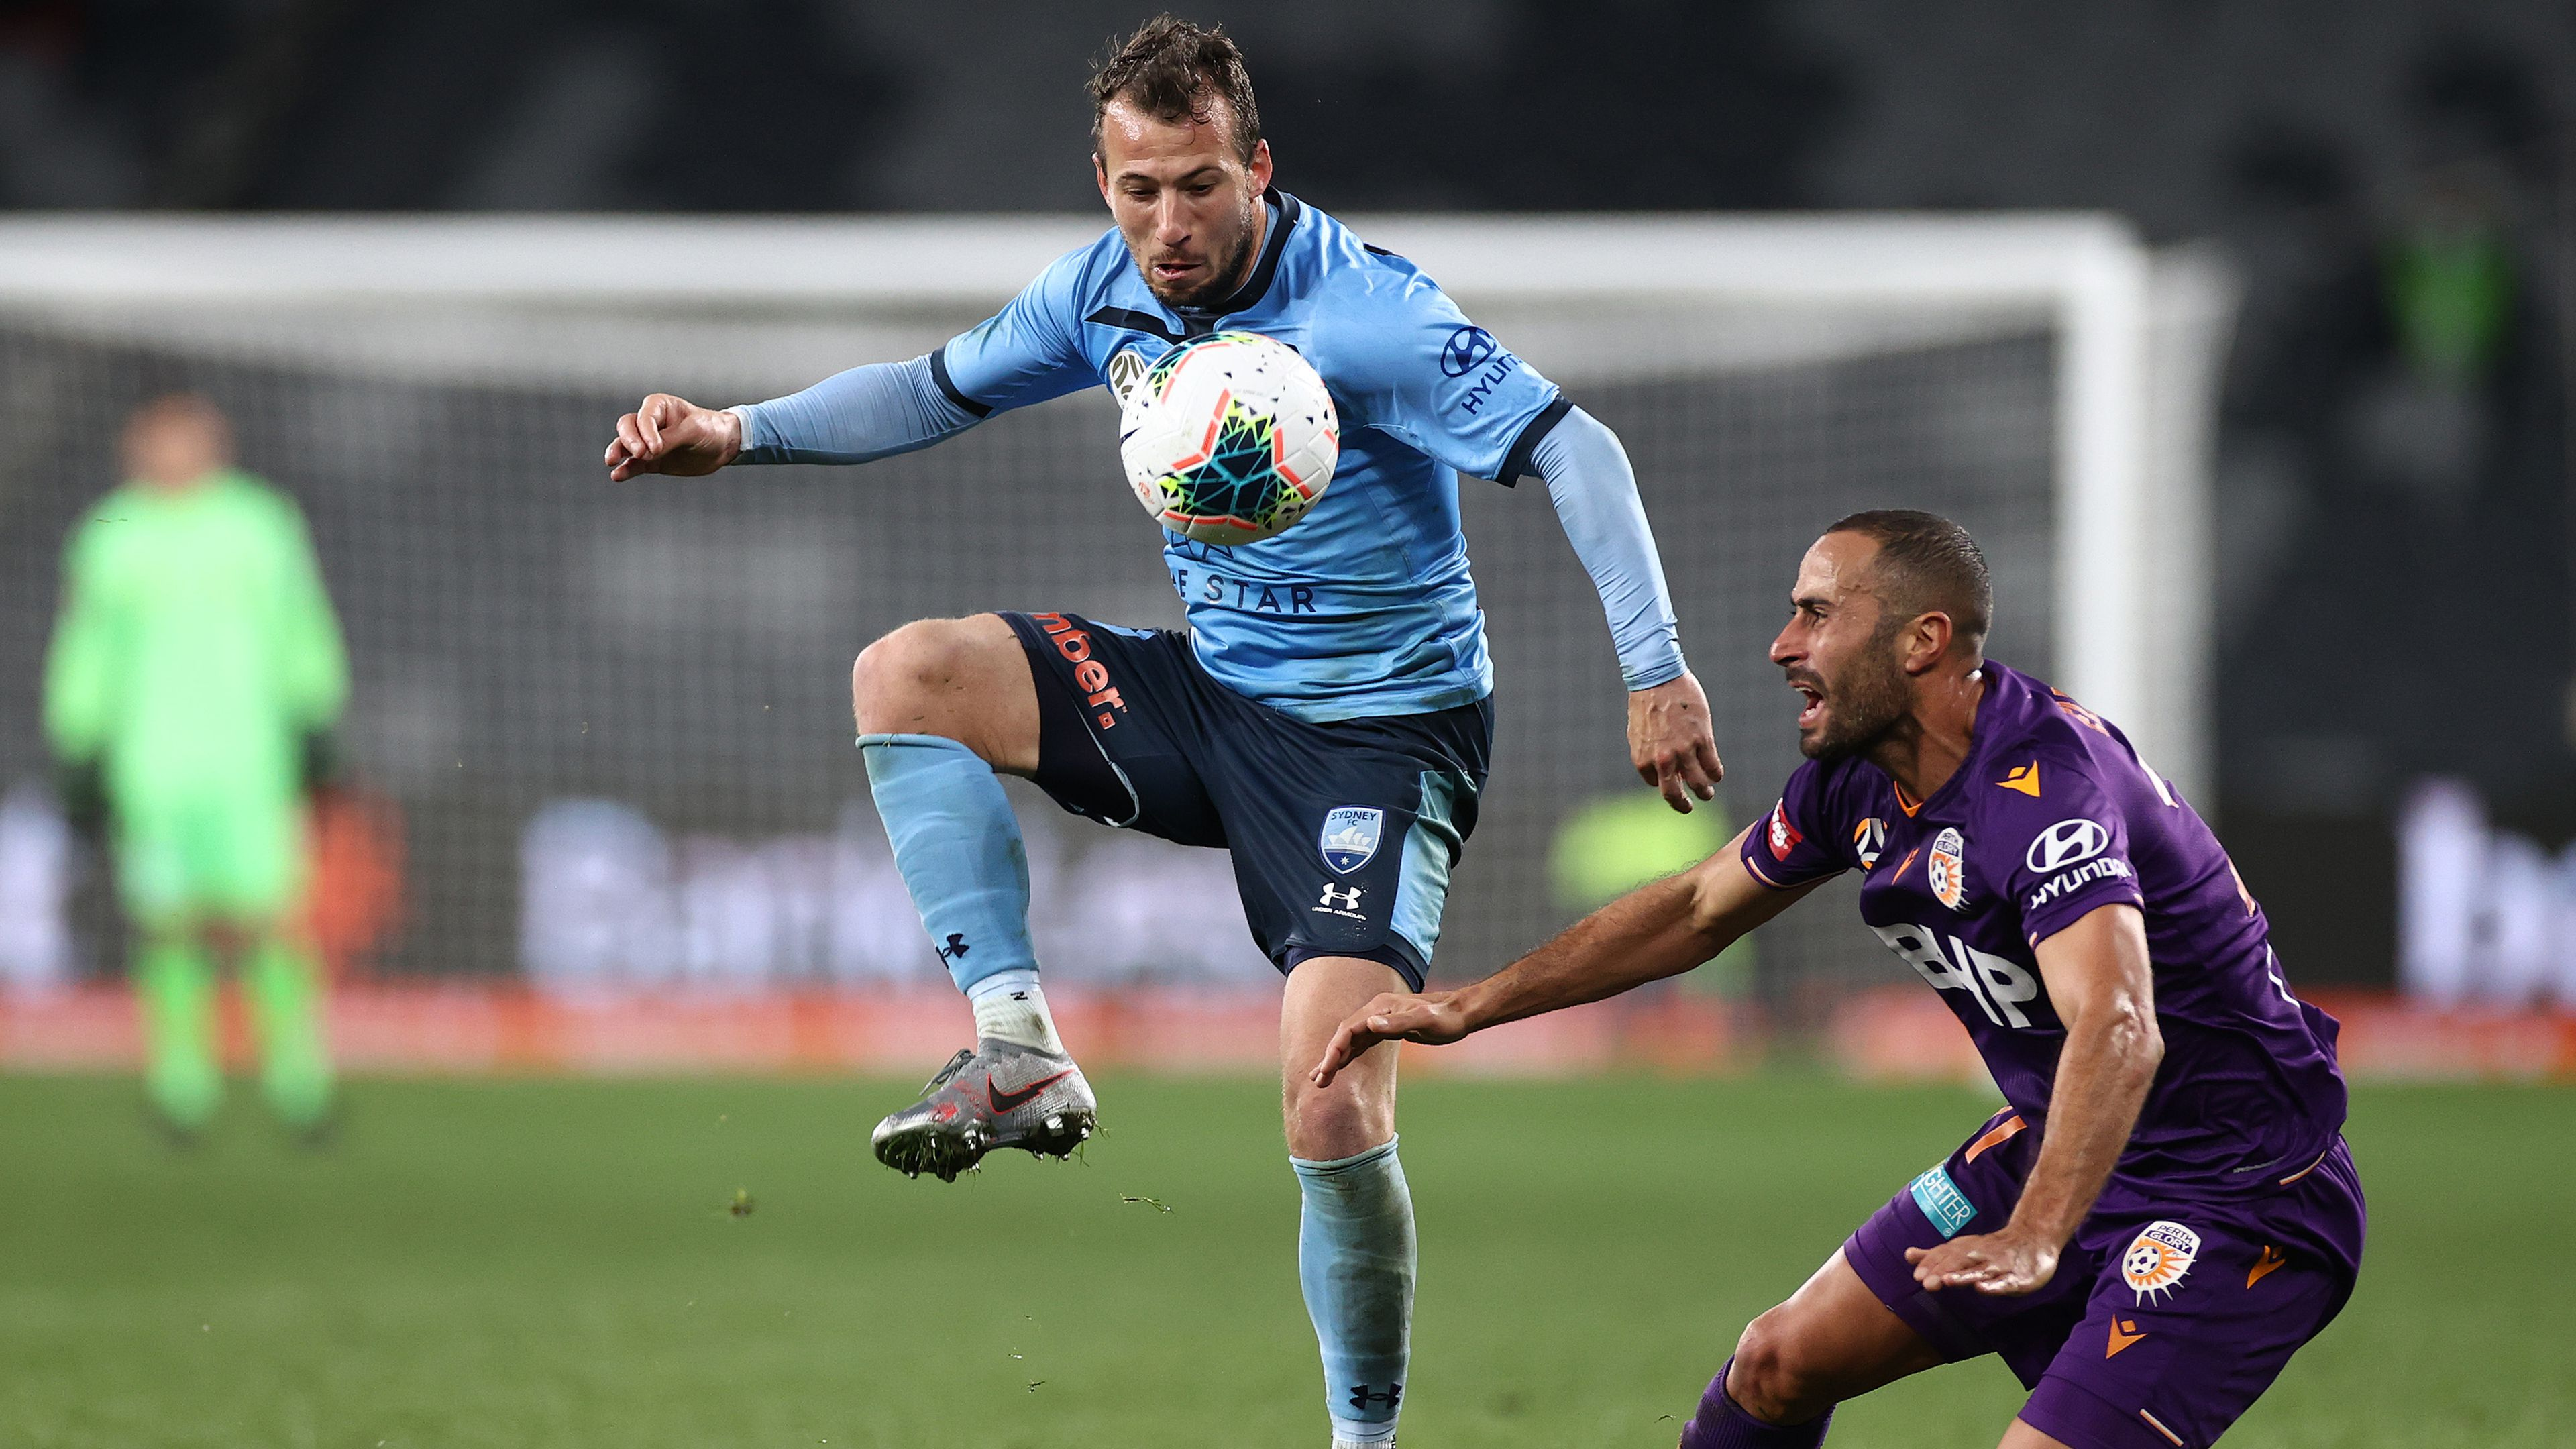 Sydney's COVID-19 outbreak forces delay of A-League, W-League seasons